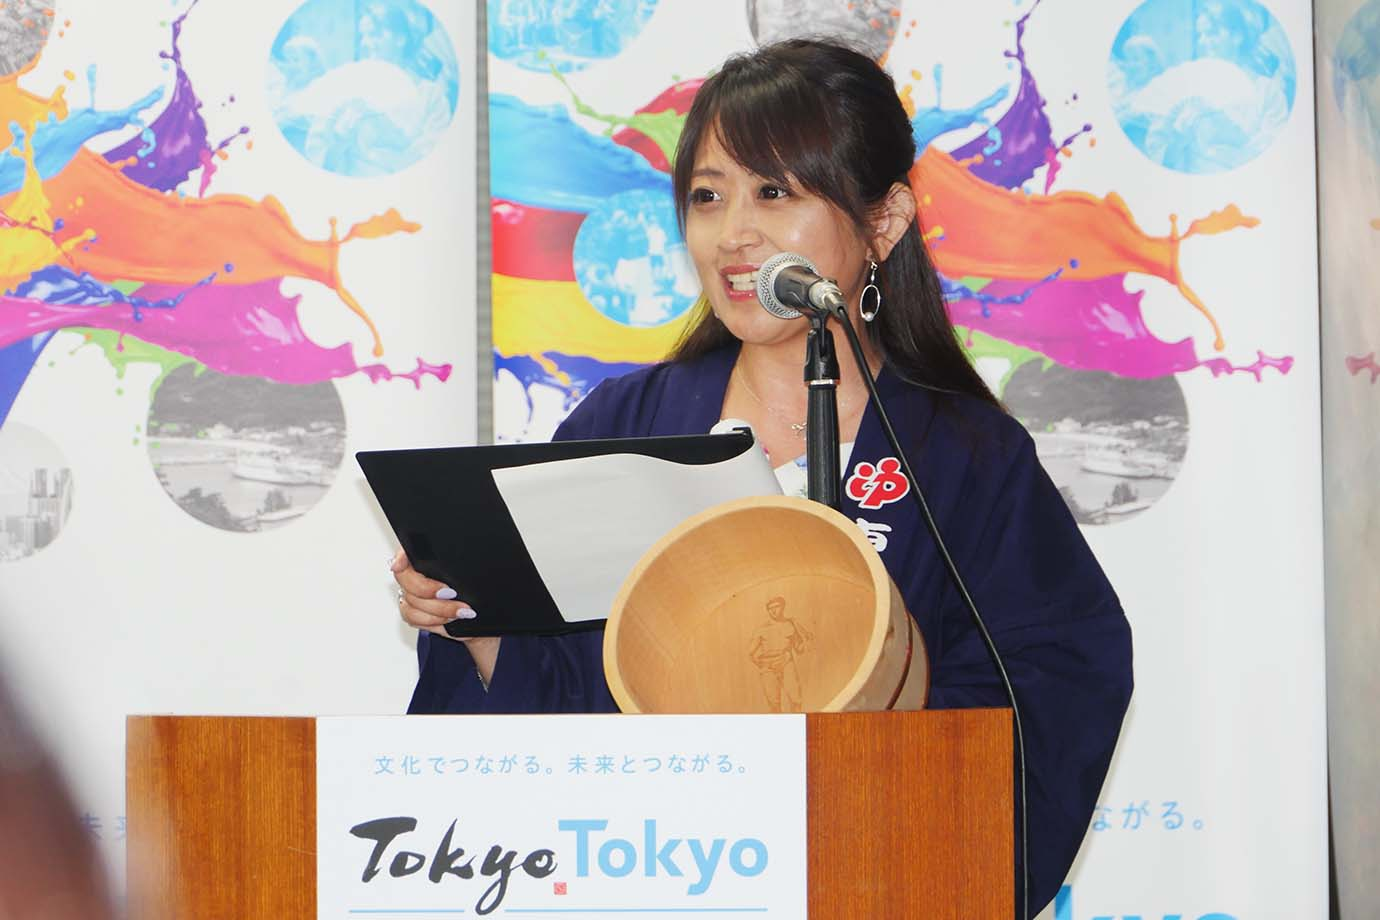 tokyo-sento-festival-2020-thermae-romae4